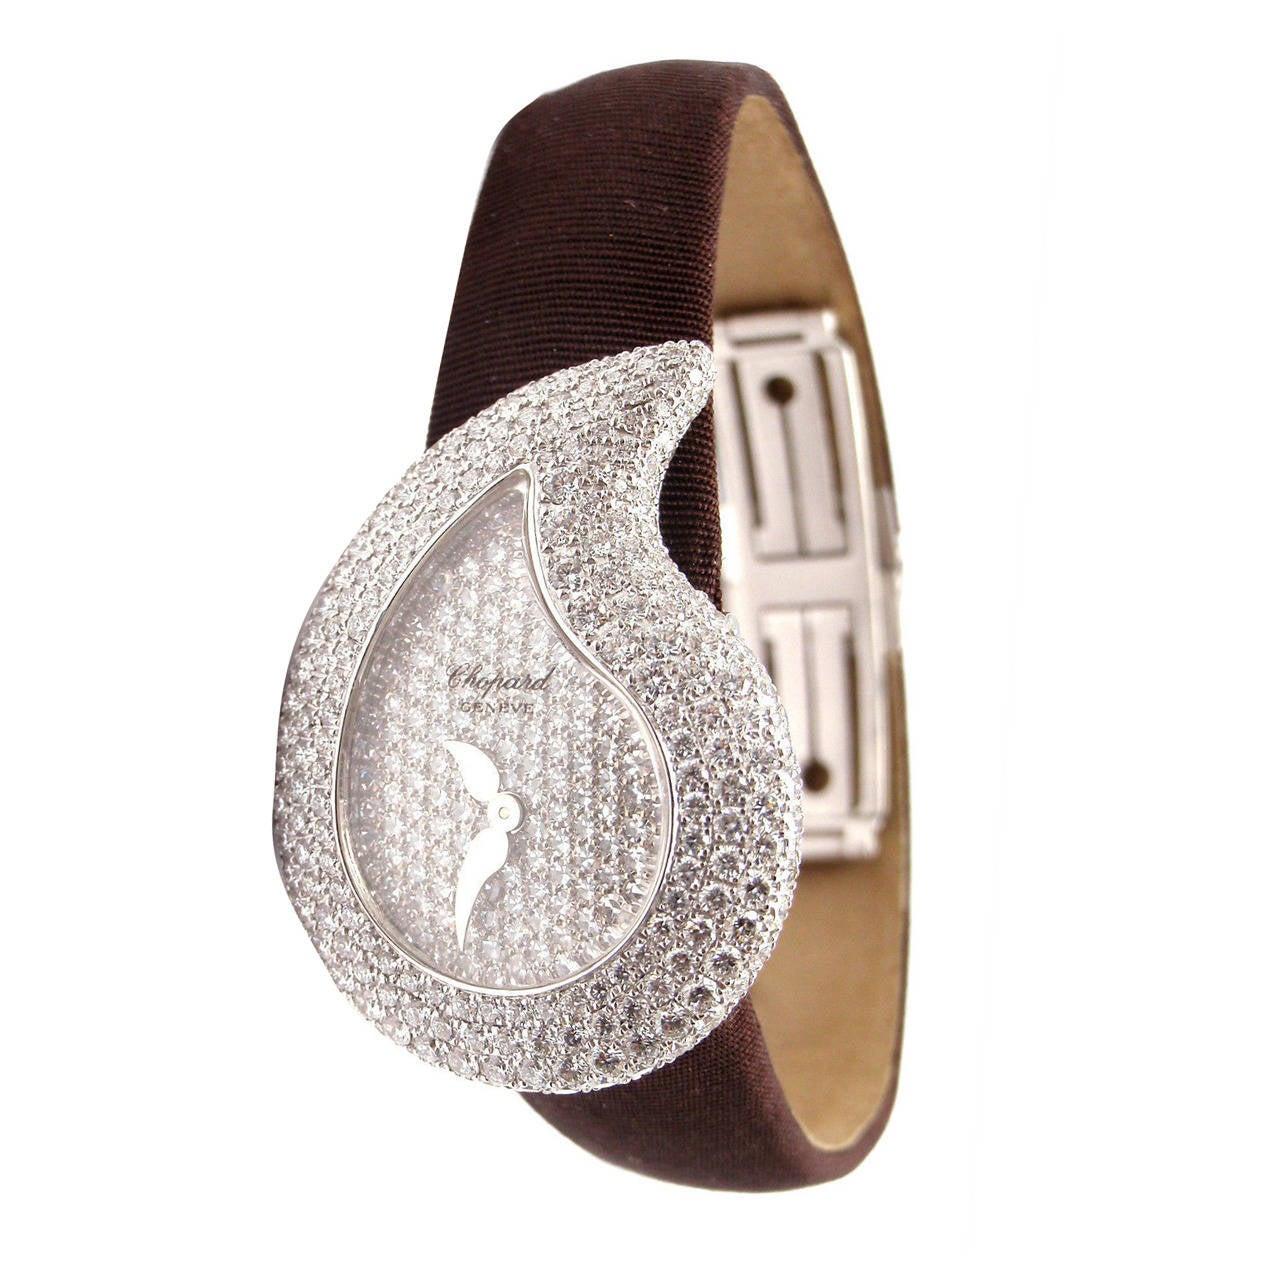 Chopard Lady's White Gold Diamond Pave Casmir Watch 1